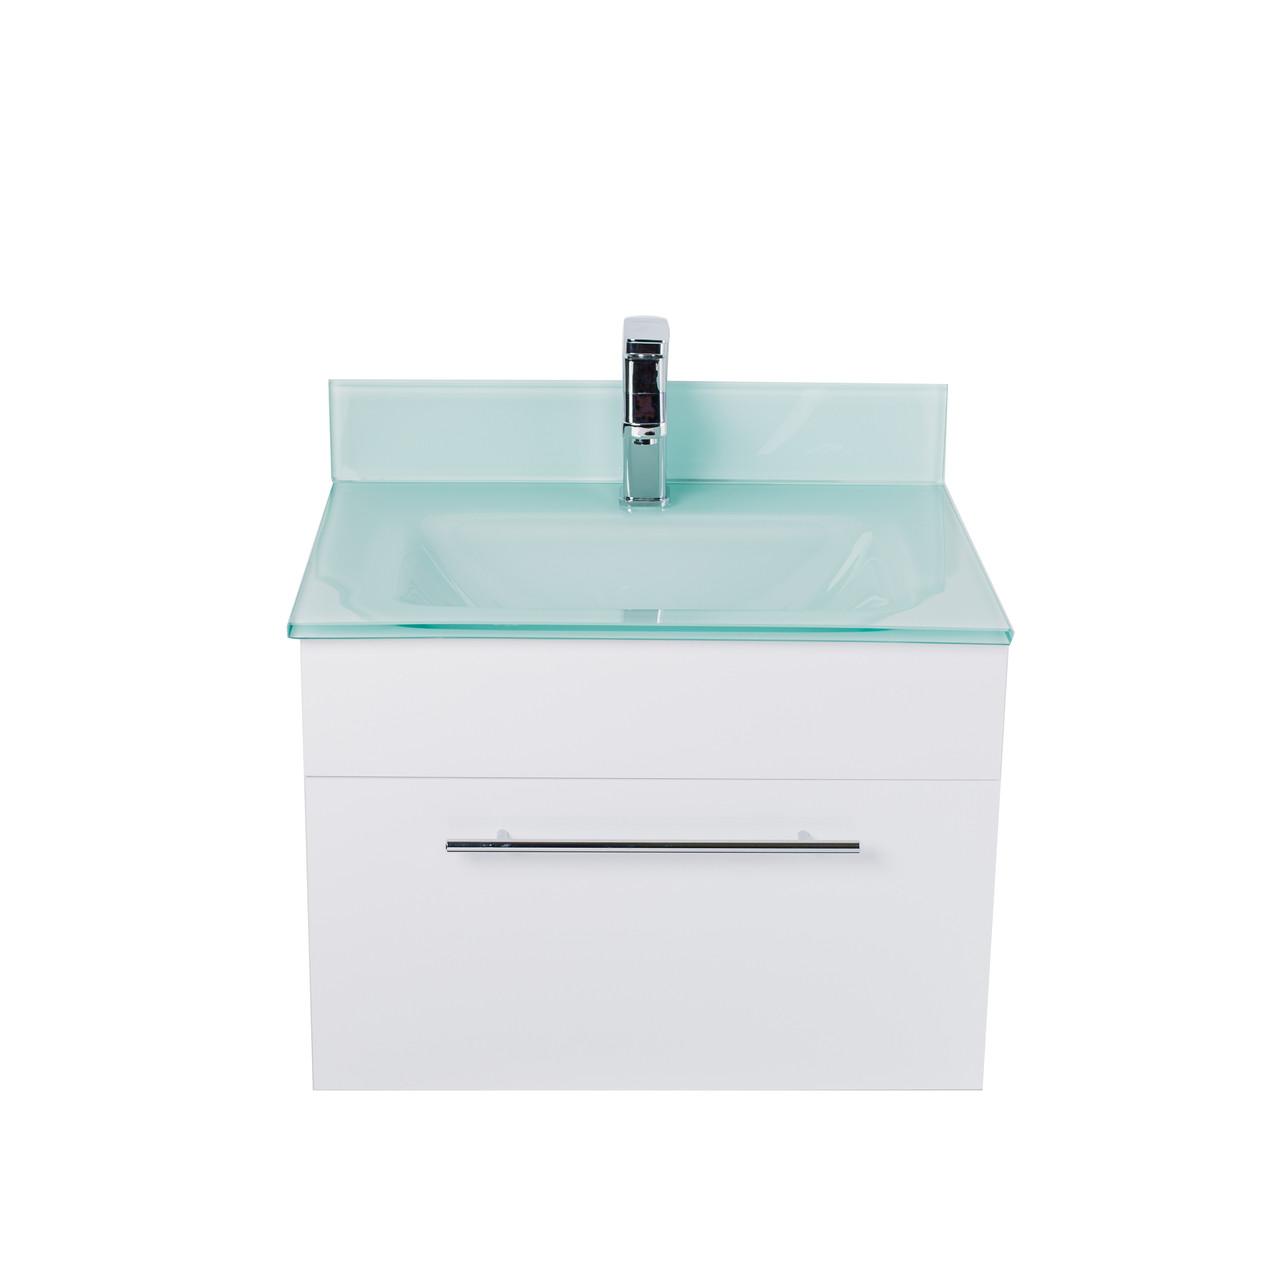 Lv 1040 White Modern 24 Wide Wall Mount Bathroom Vanity With Back Splash Lorixon Product